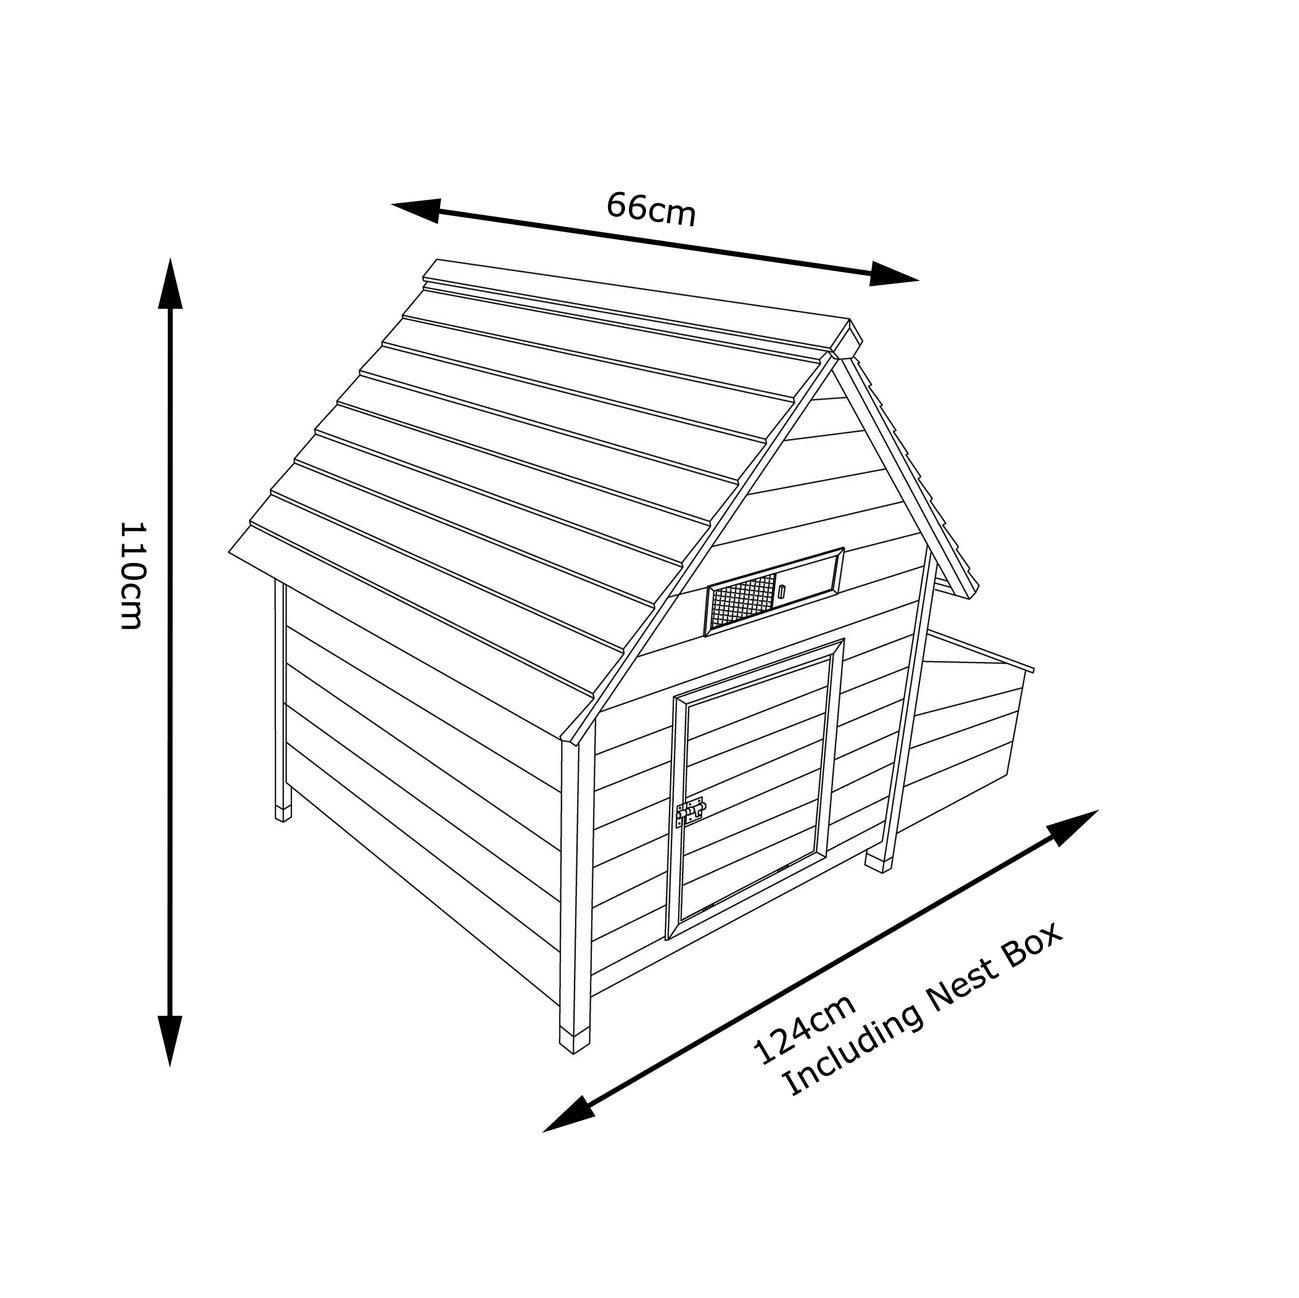 Cocoon Chicken Hen House Coop Poultry Ark Run Brand New